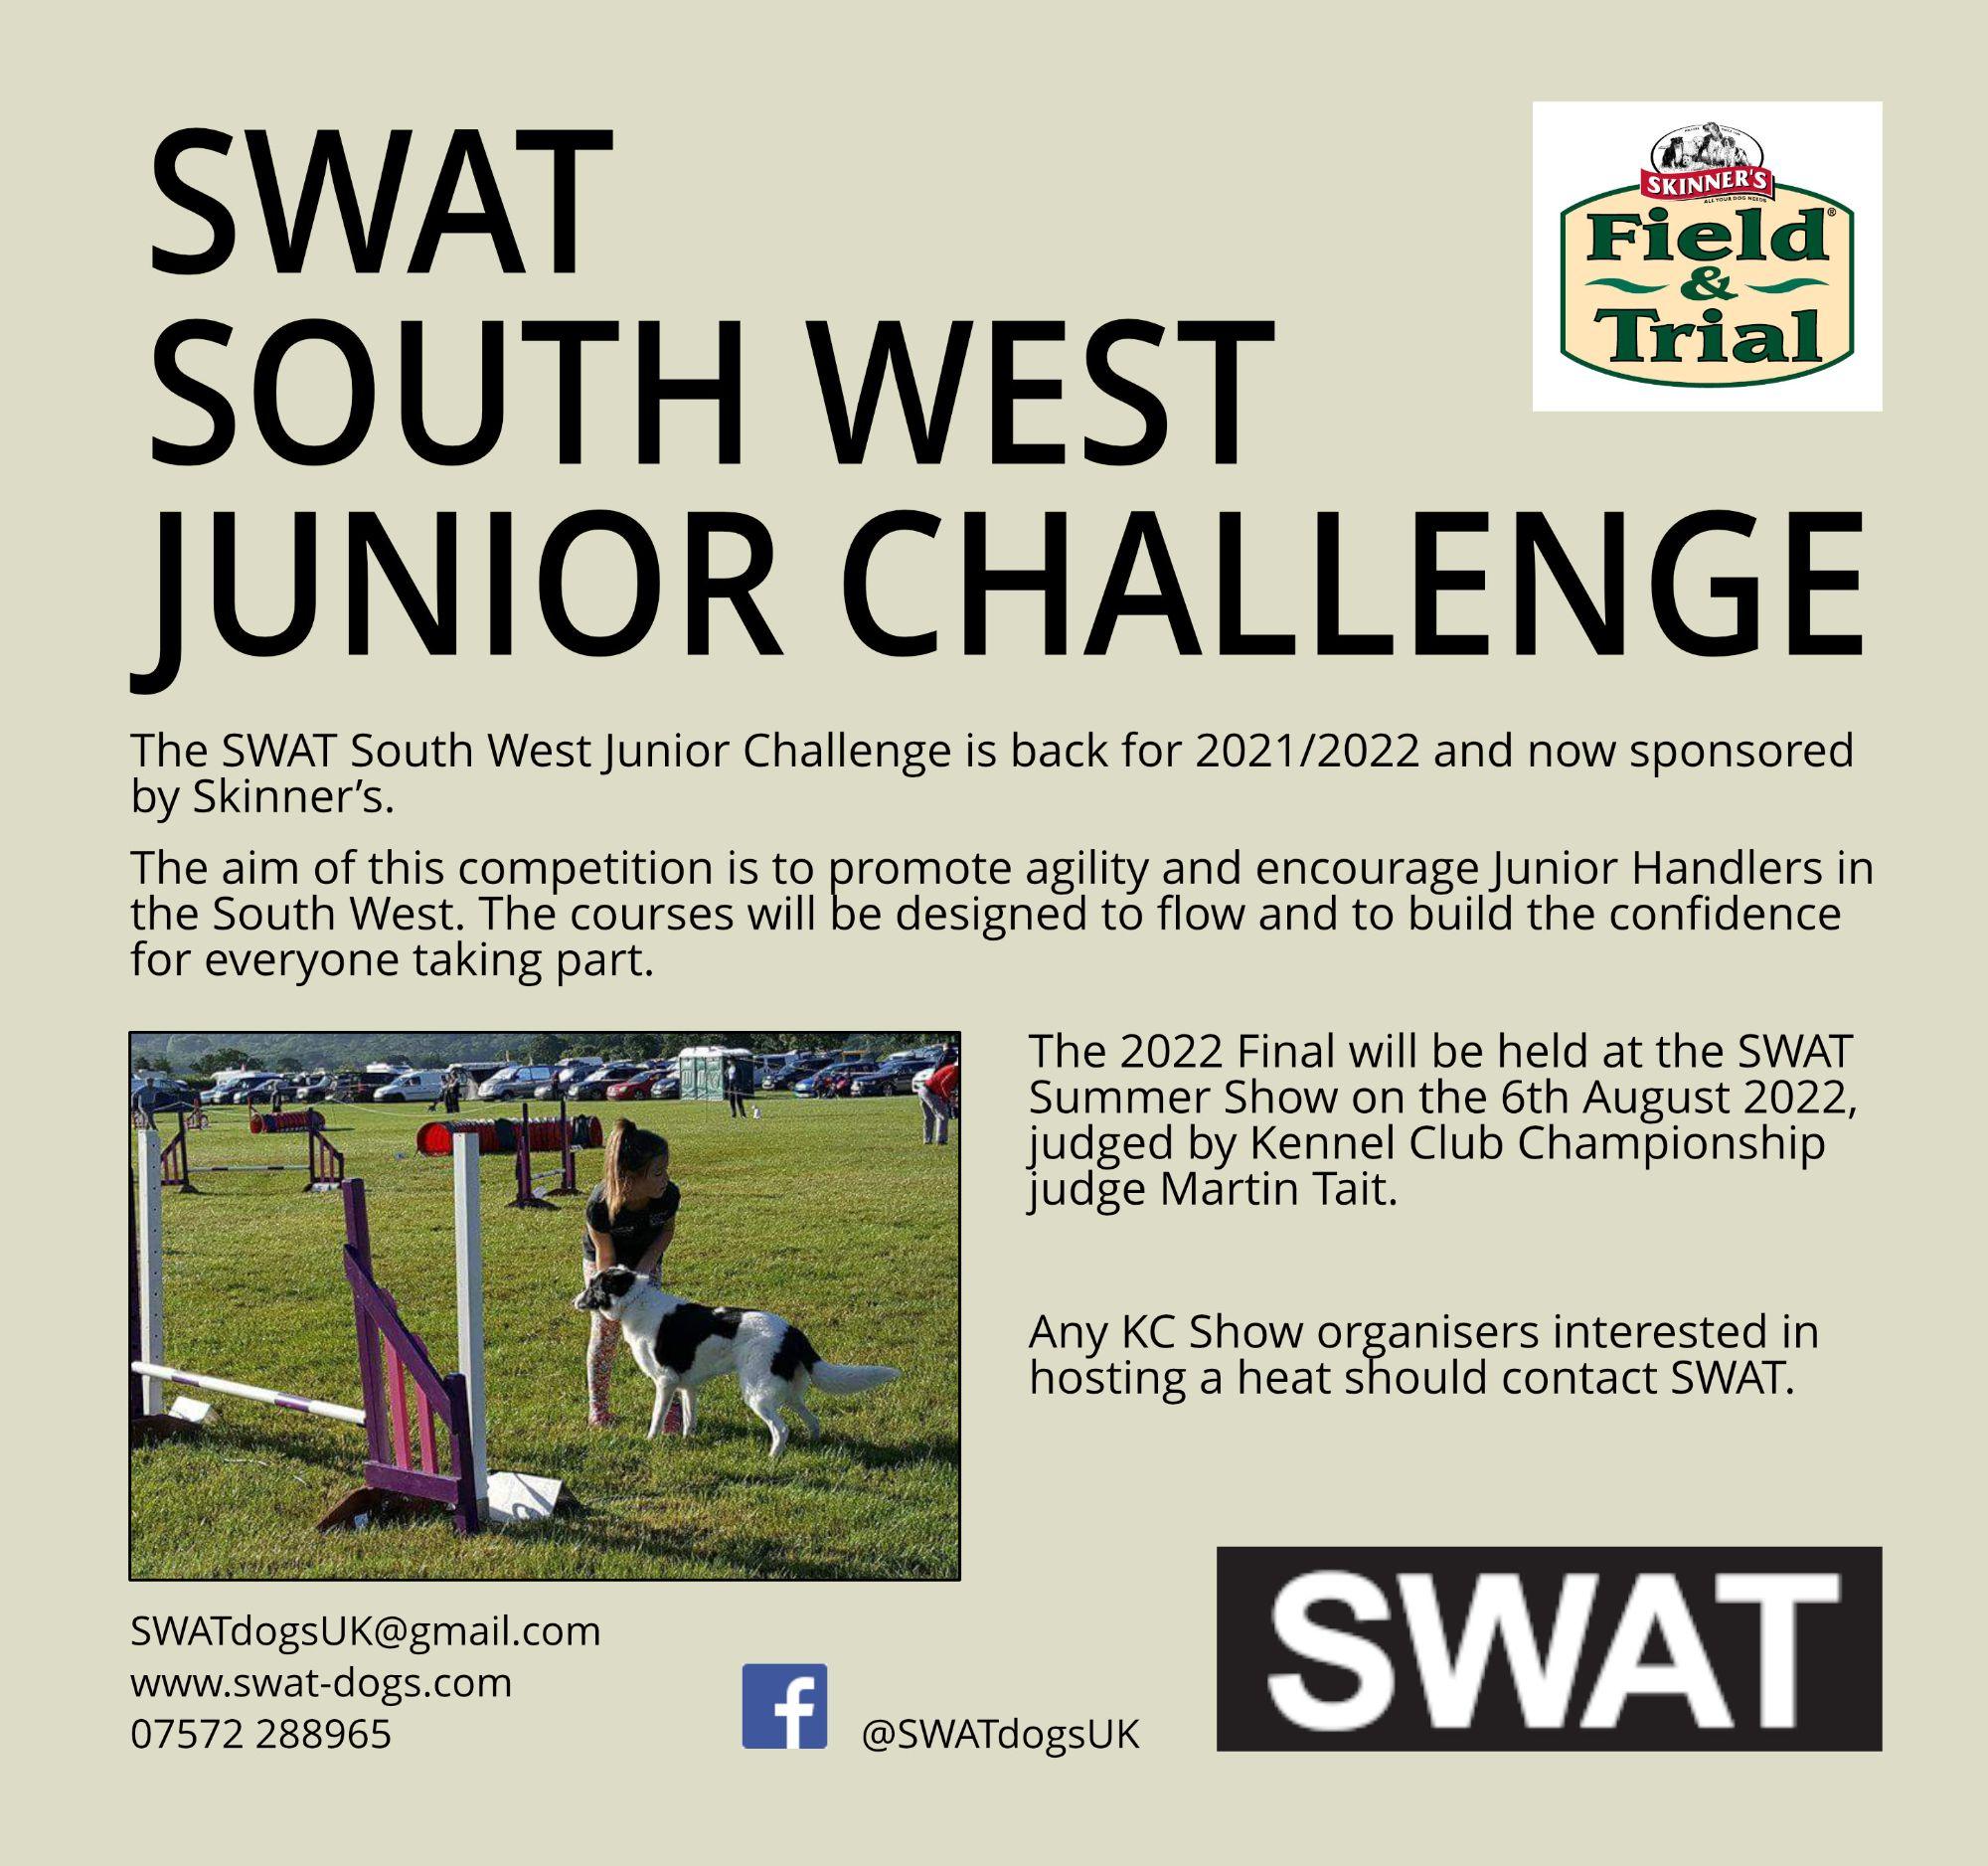 SWAT South West Junior Challenge sponsored by Skinner's